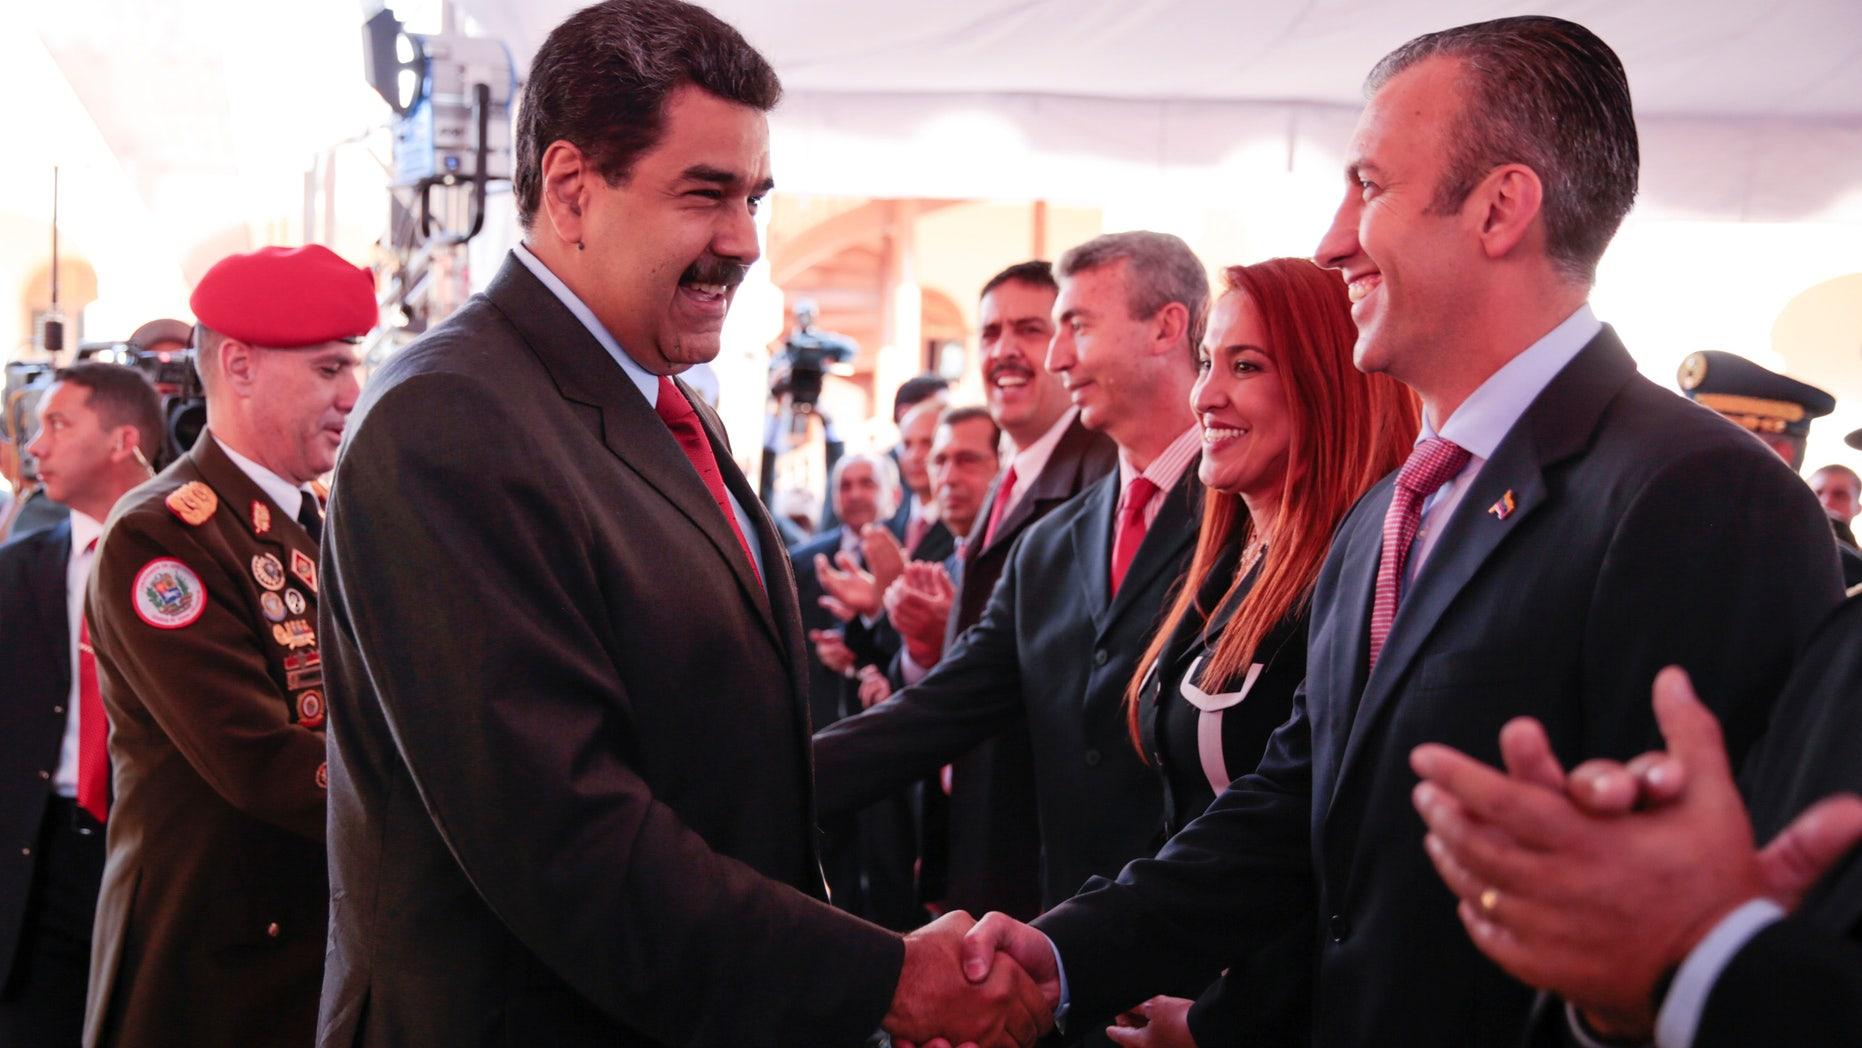 Venezuela's President Nicolas Maduro and VP Tarek El Aissami in Caracas, Venezuela on Jan. 4, 2017